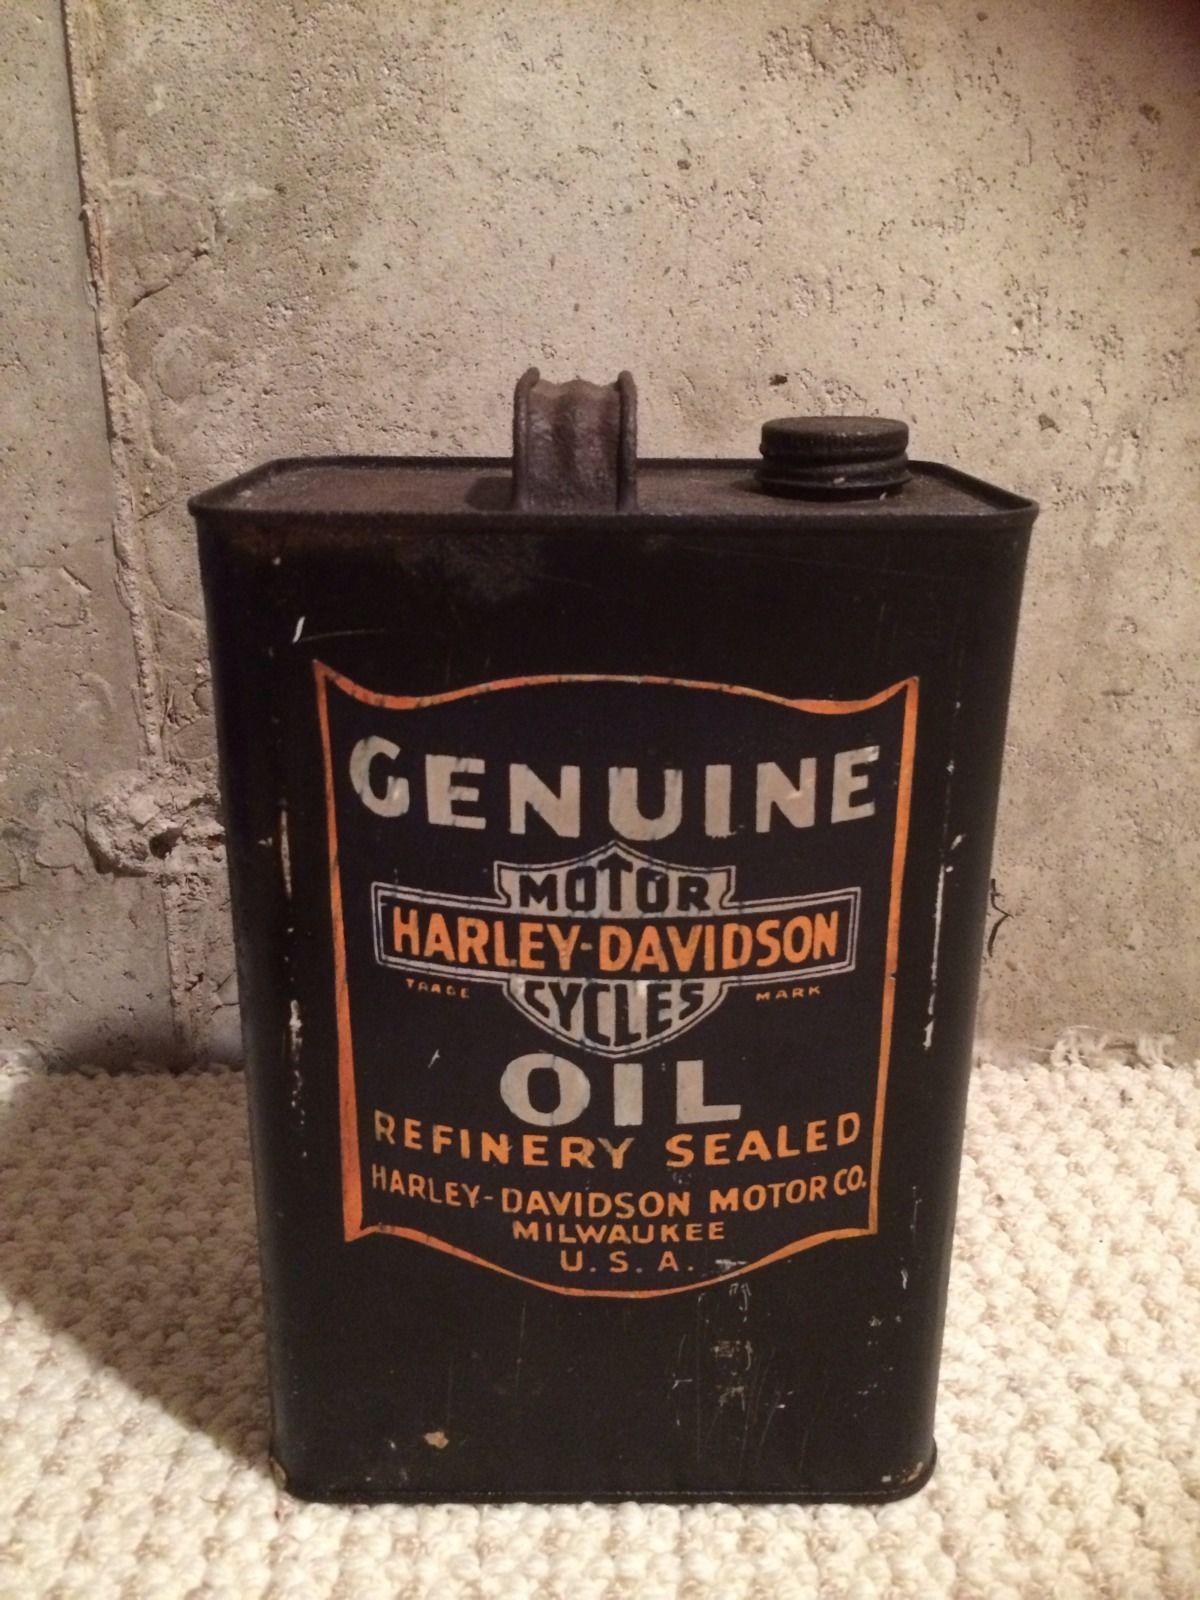 Very Rare Vintage Harley Davidson 10 Oil Can Harley Davidson